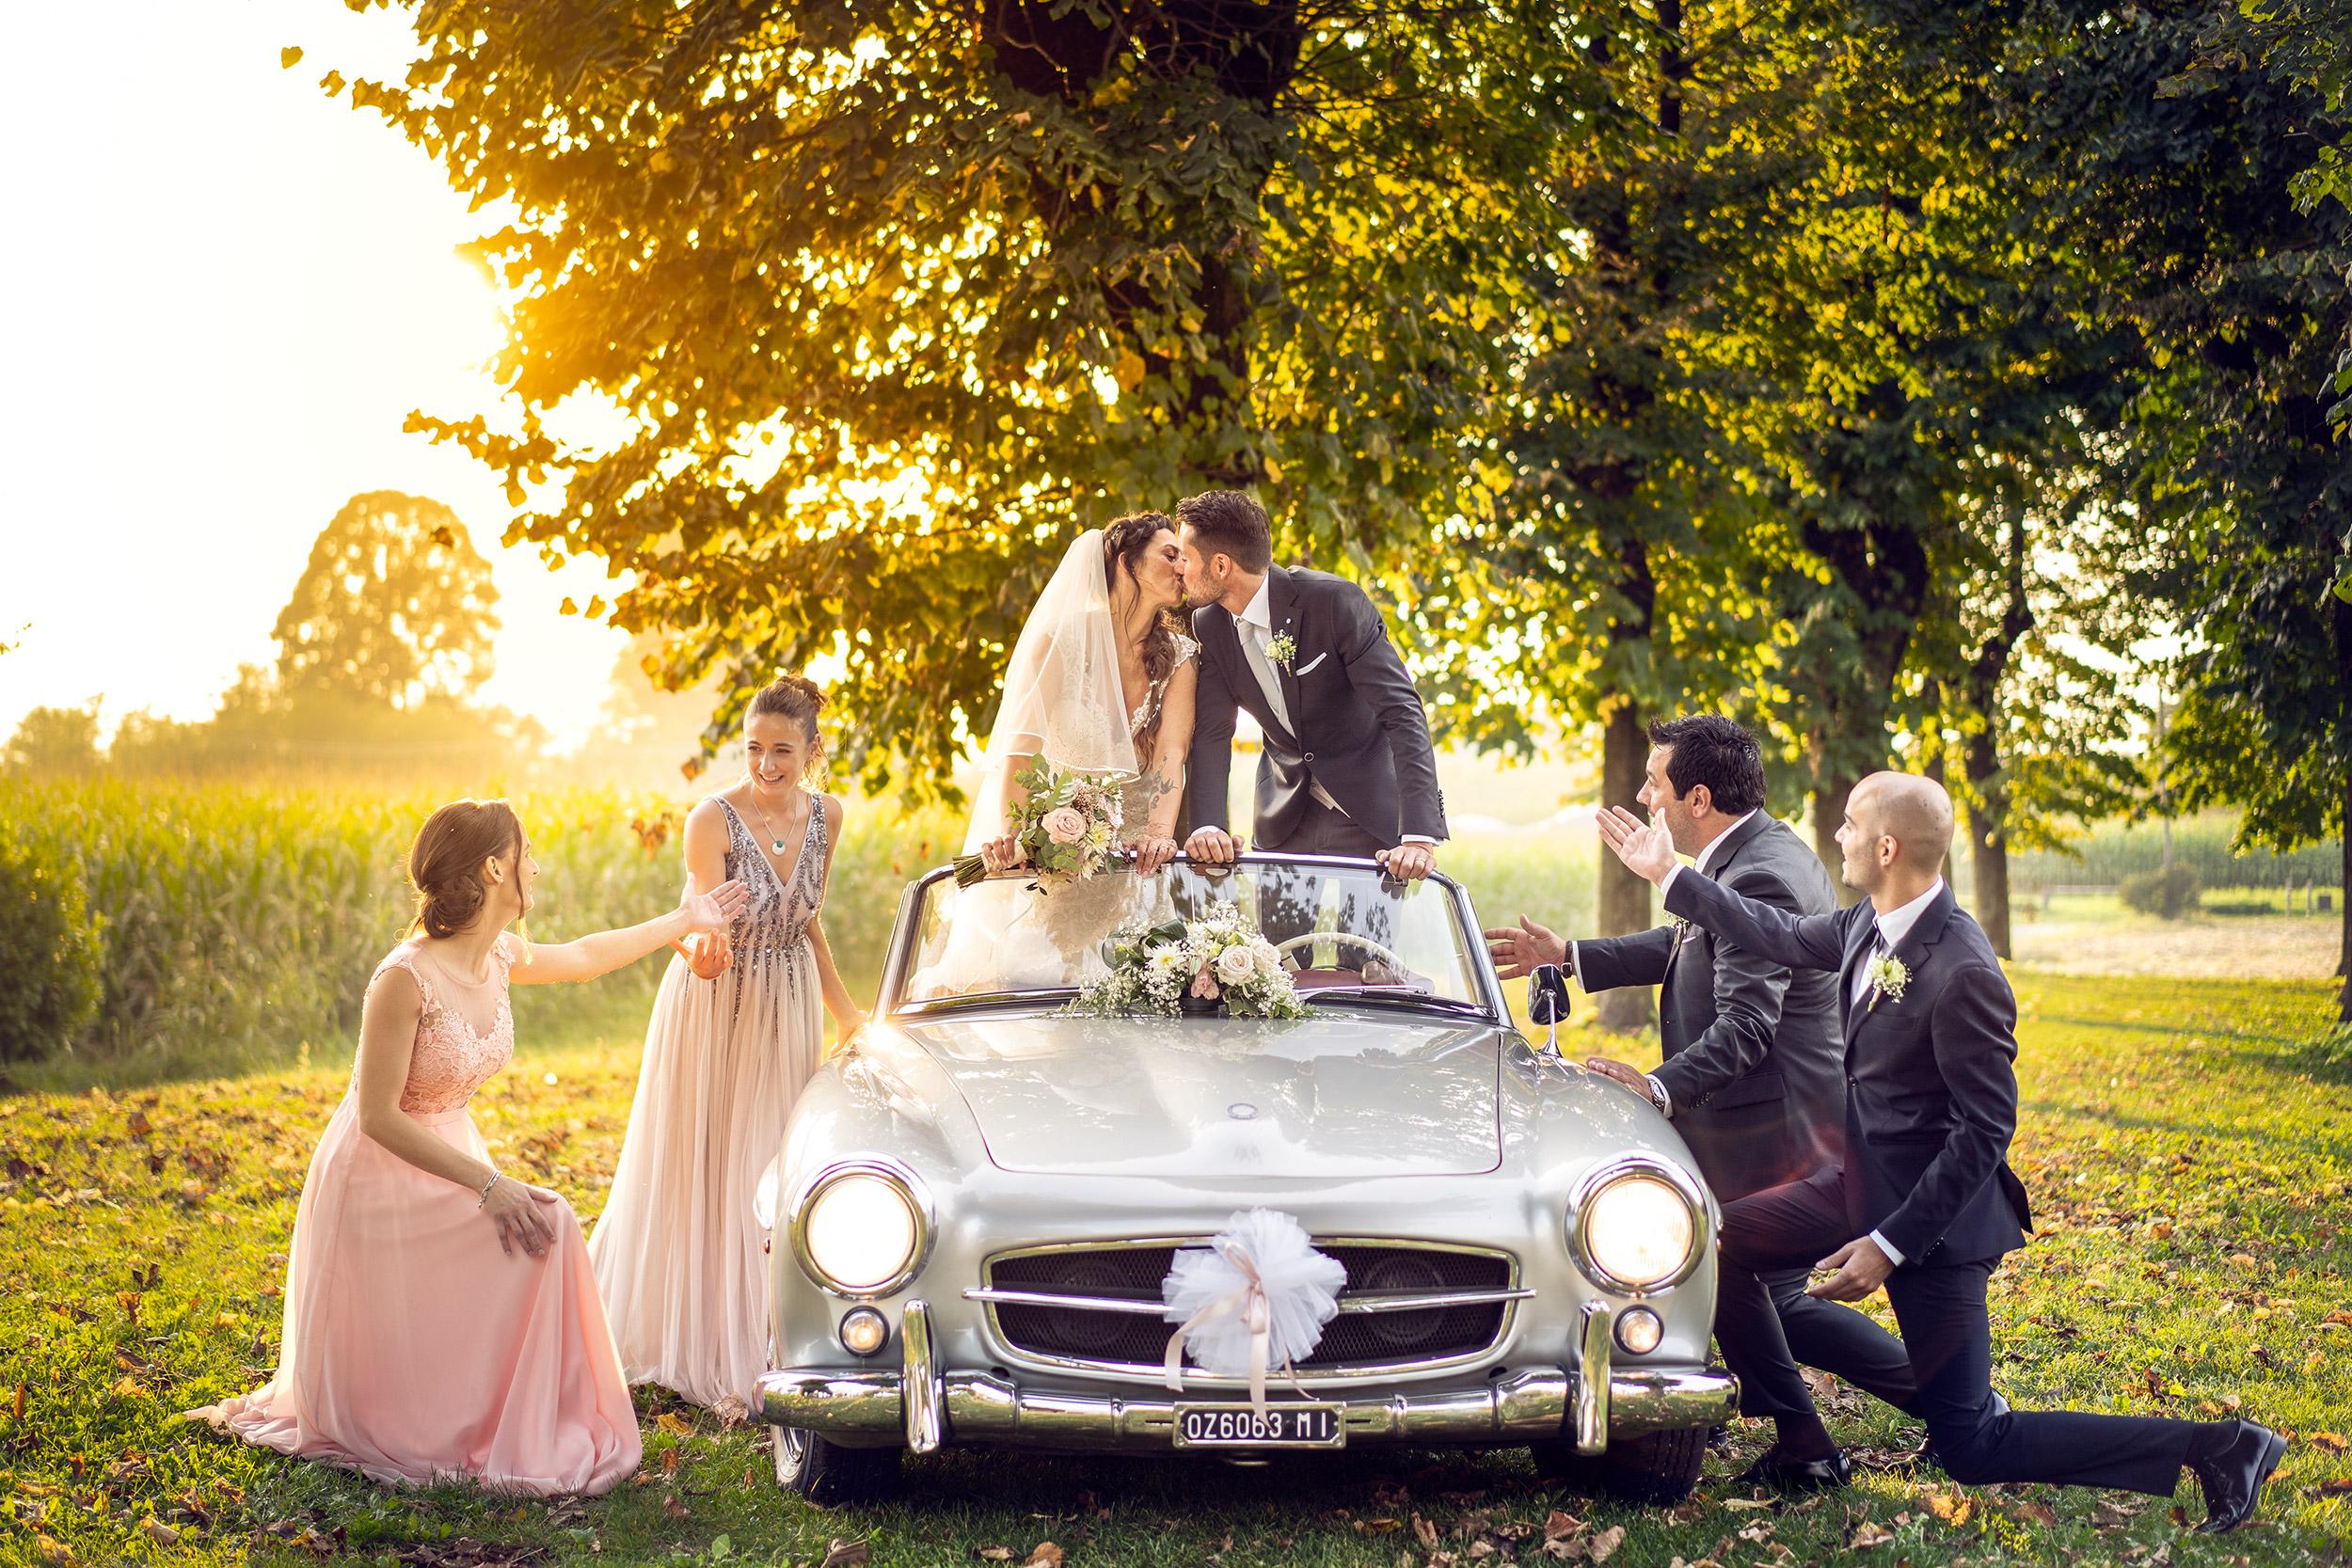 000 reportage sposi foto matrimonio wedding villa acquaroli carvico bergamo copia 1